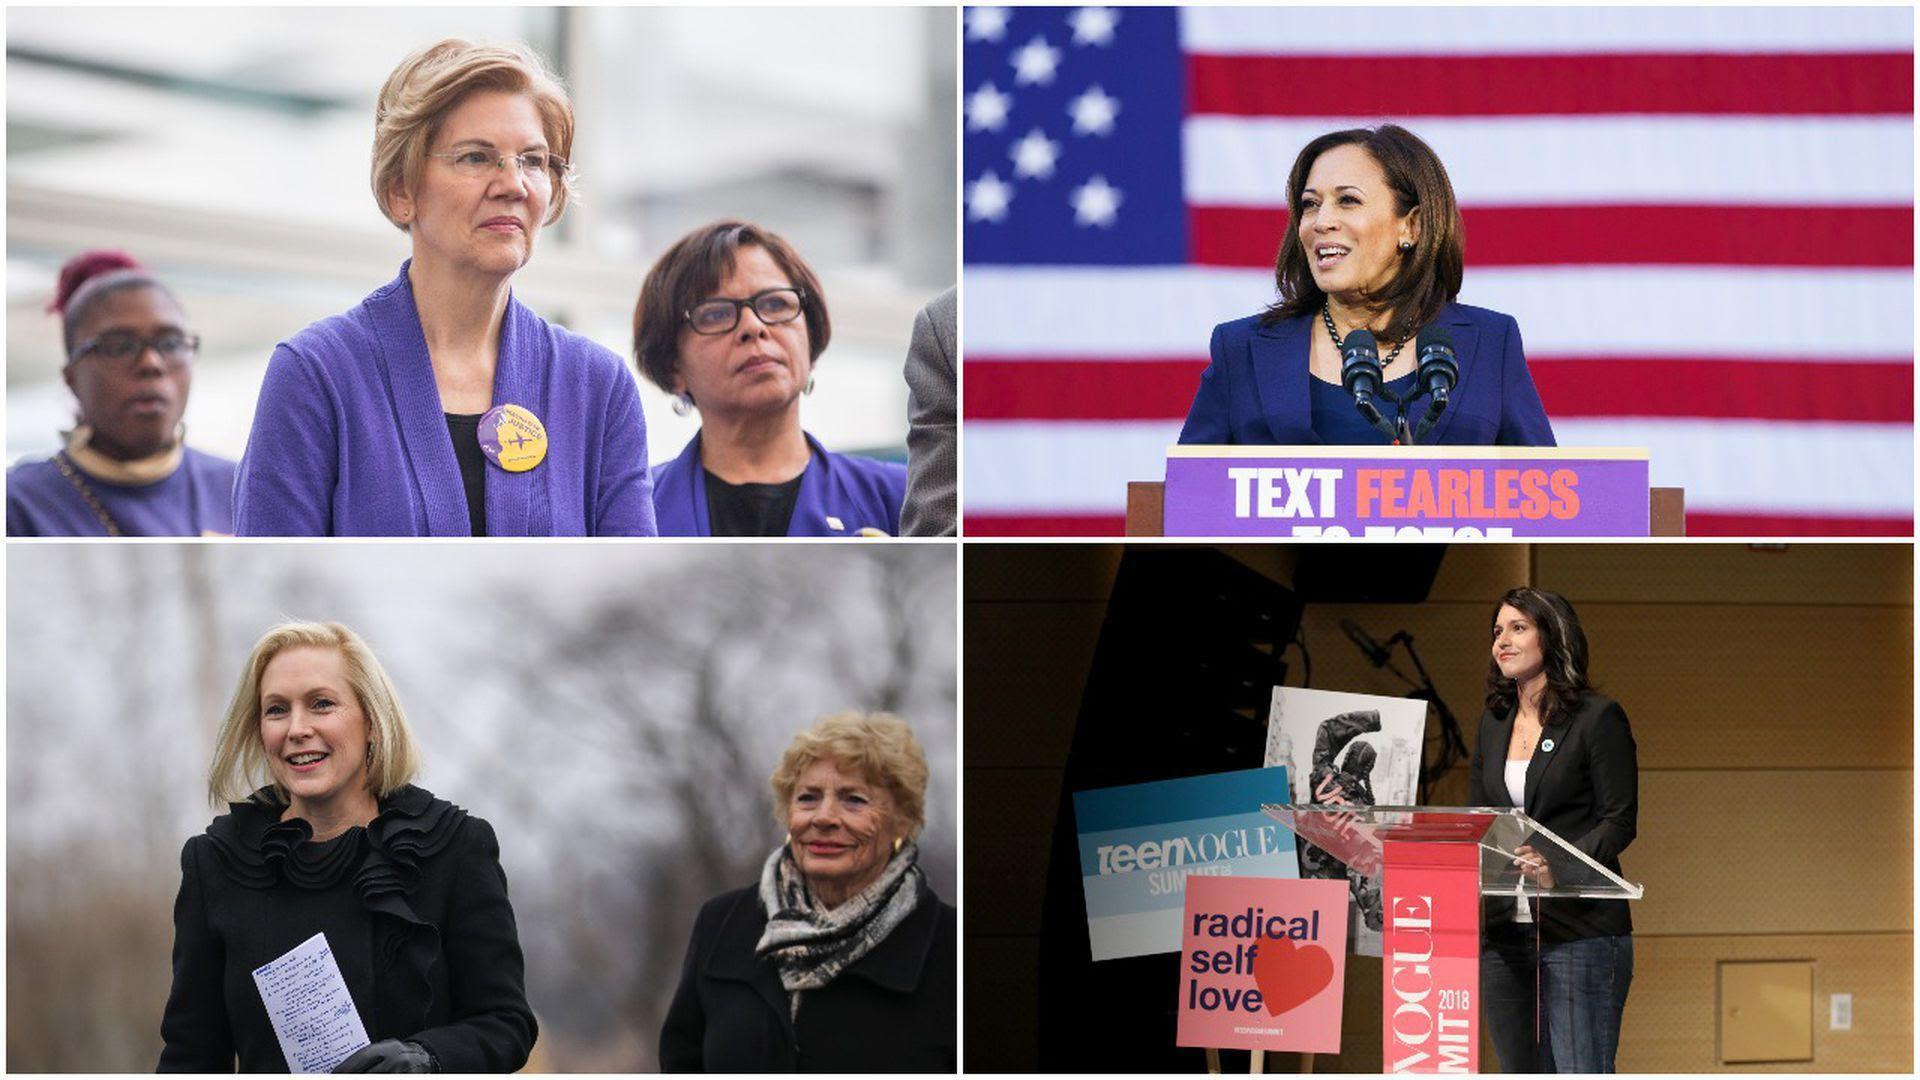 Elizabeth Warren, Kirsten Gillibrand, Tulsi Gabbard, and Kamala Harris.